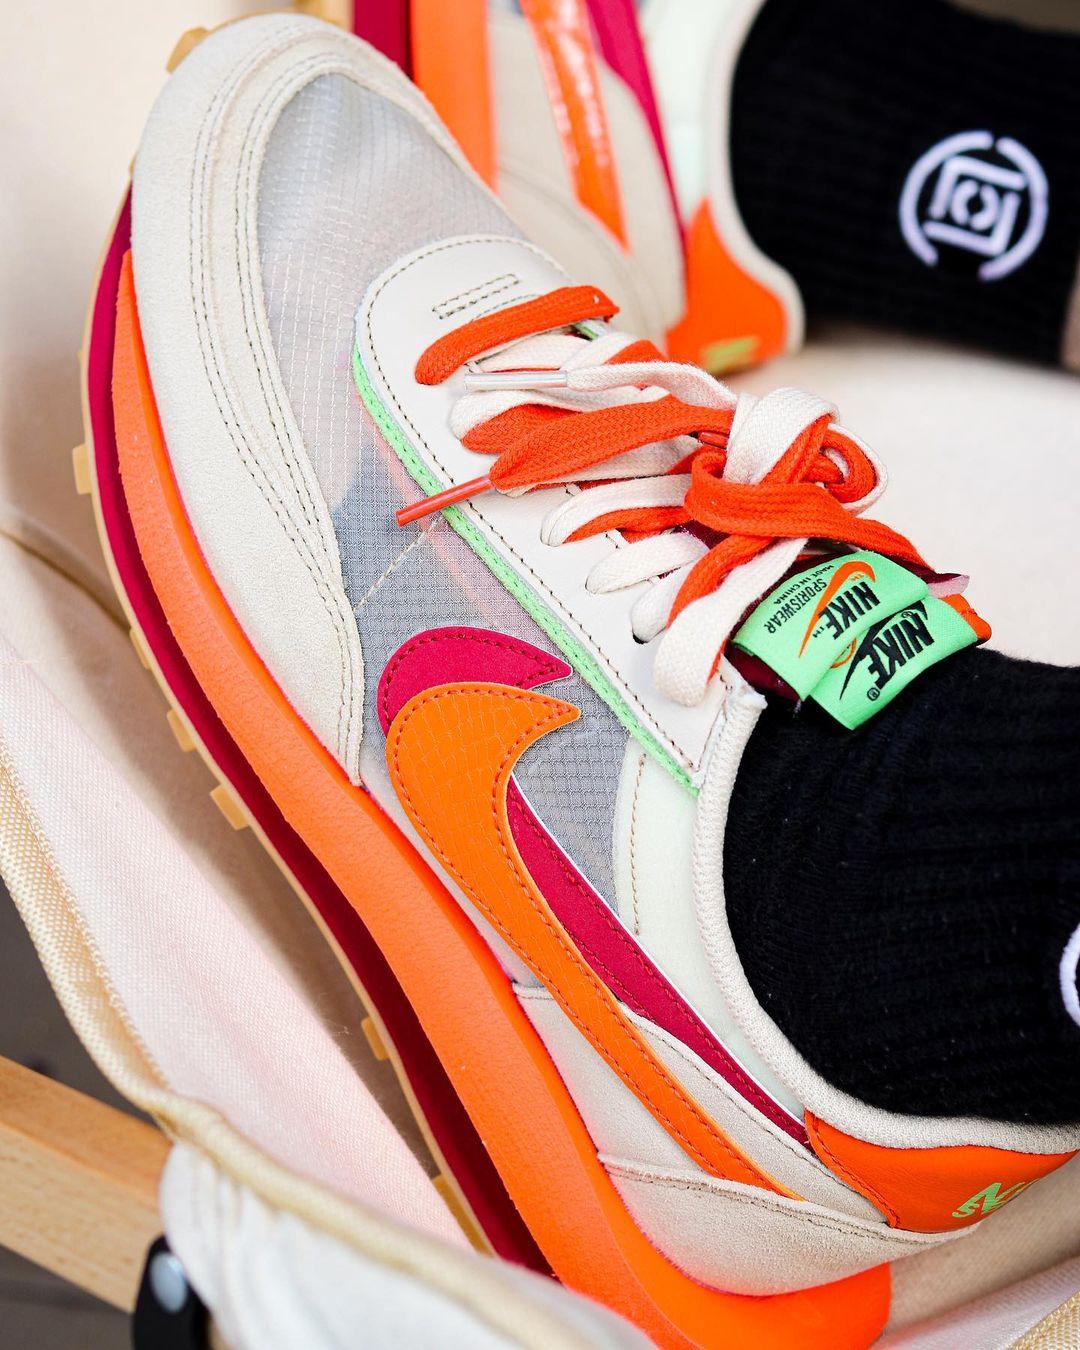 CLOT,sacai,Nike,LDWaffle,发售  冠希晒实物!CLOT x sacai x Nike 正式官宣!下月初发售!